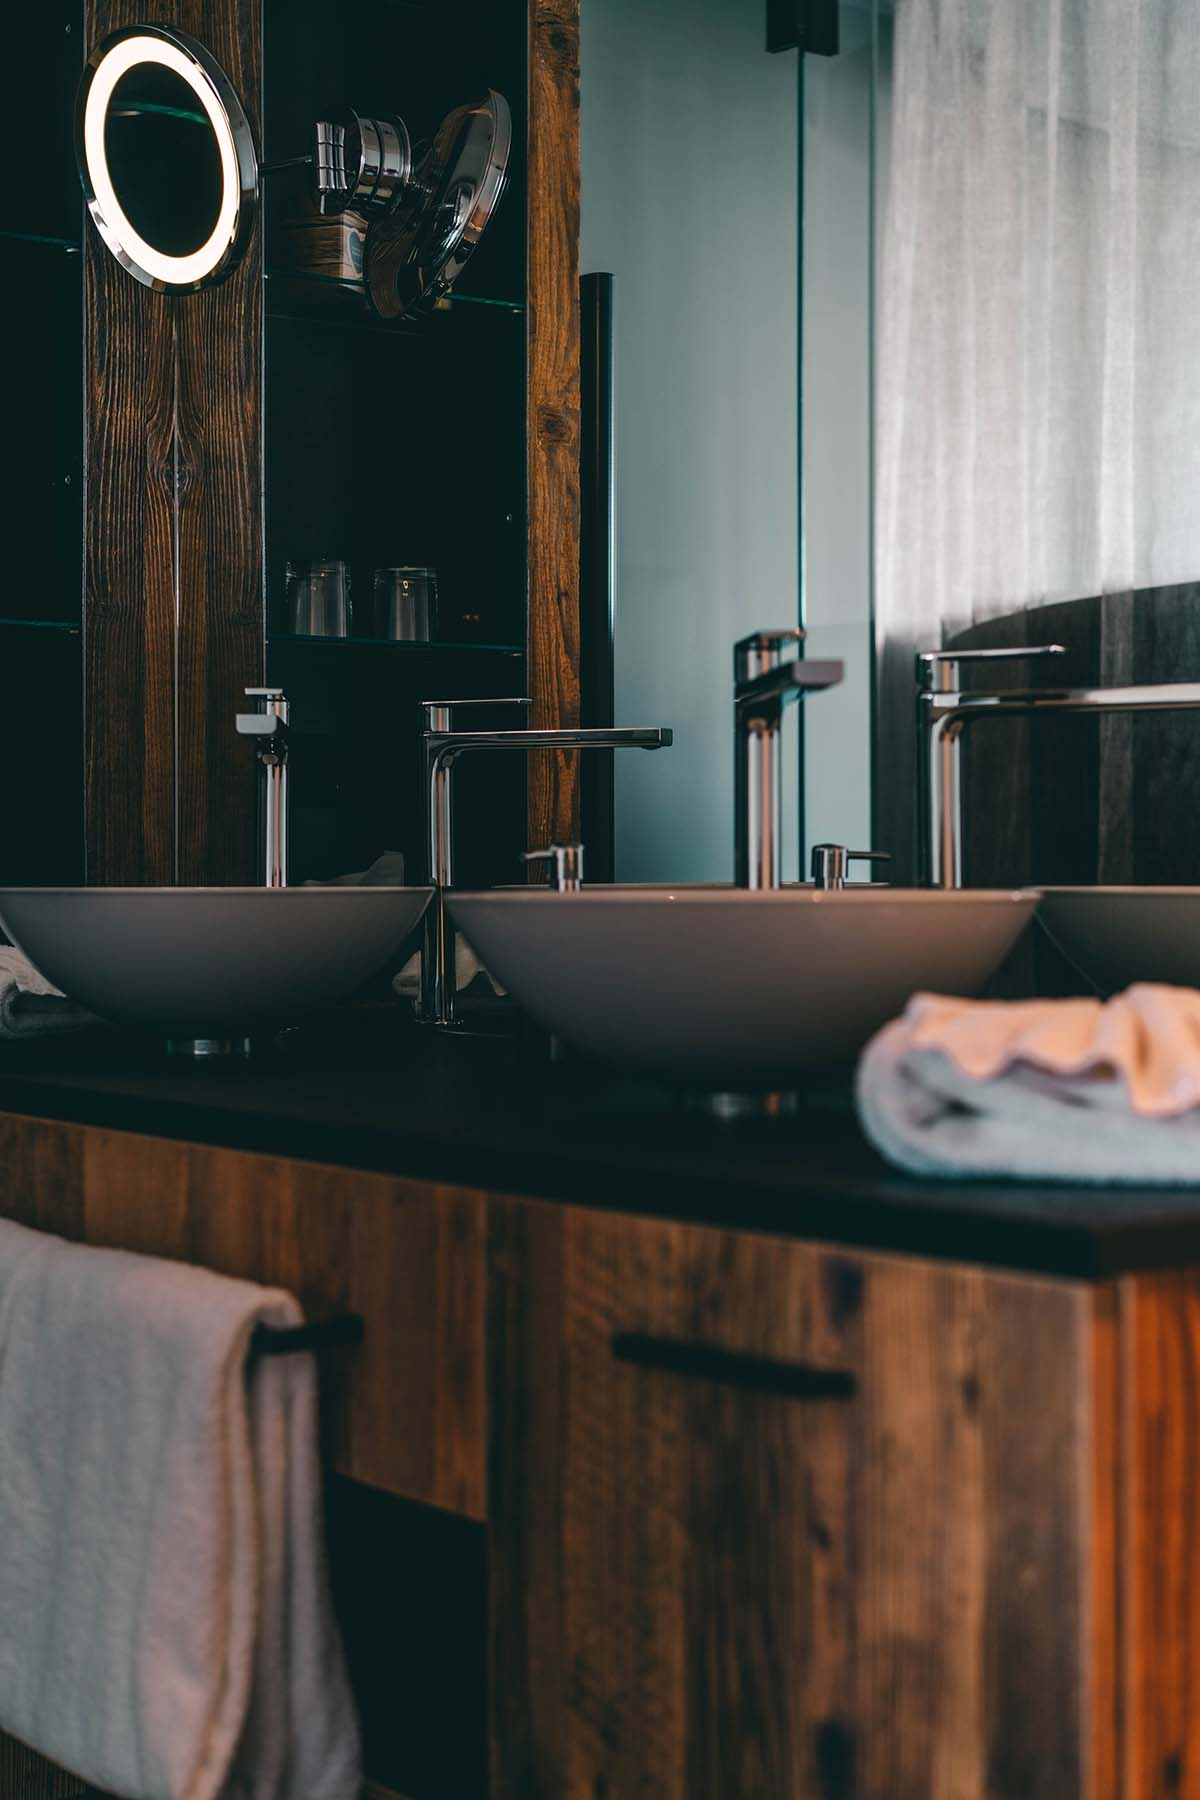 wellnesshotel-huettenhof-waschtisch